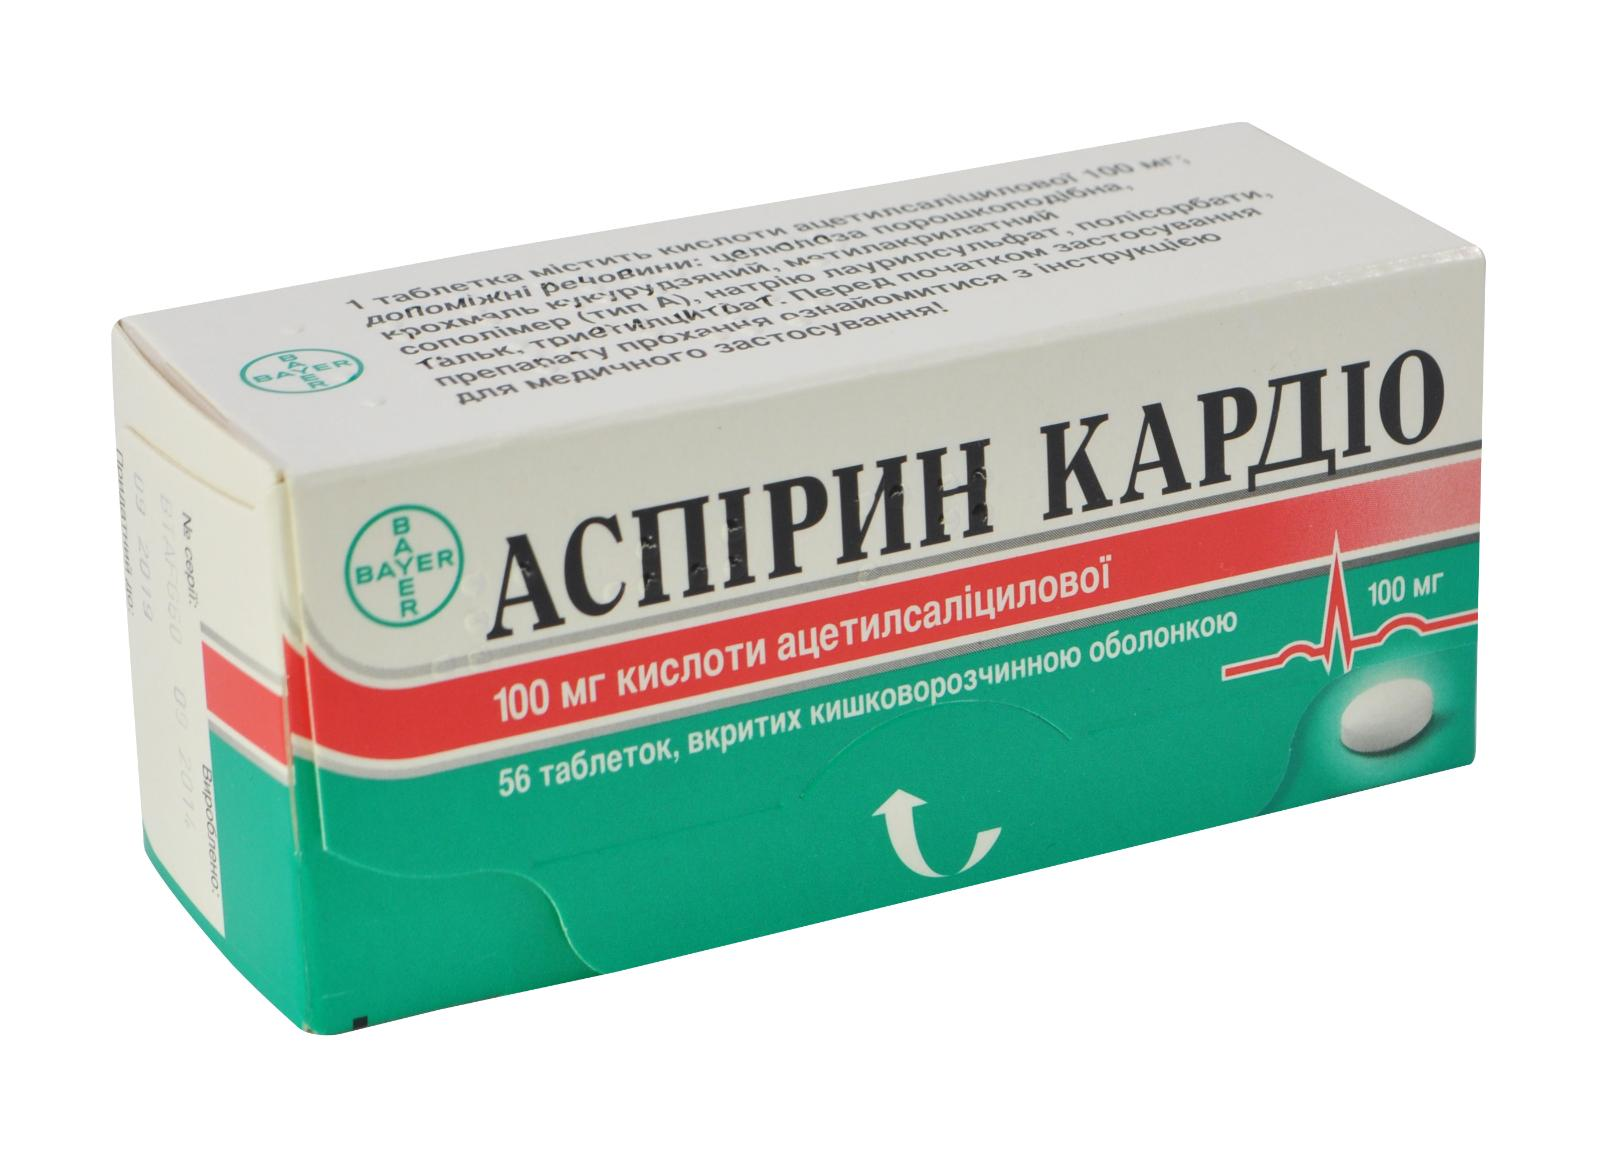 956 АКАРД - Acetylsalicylic acid